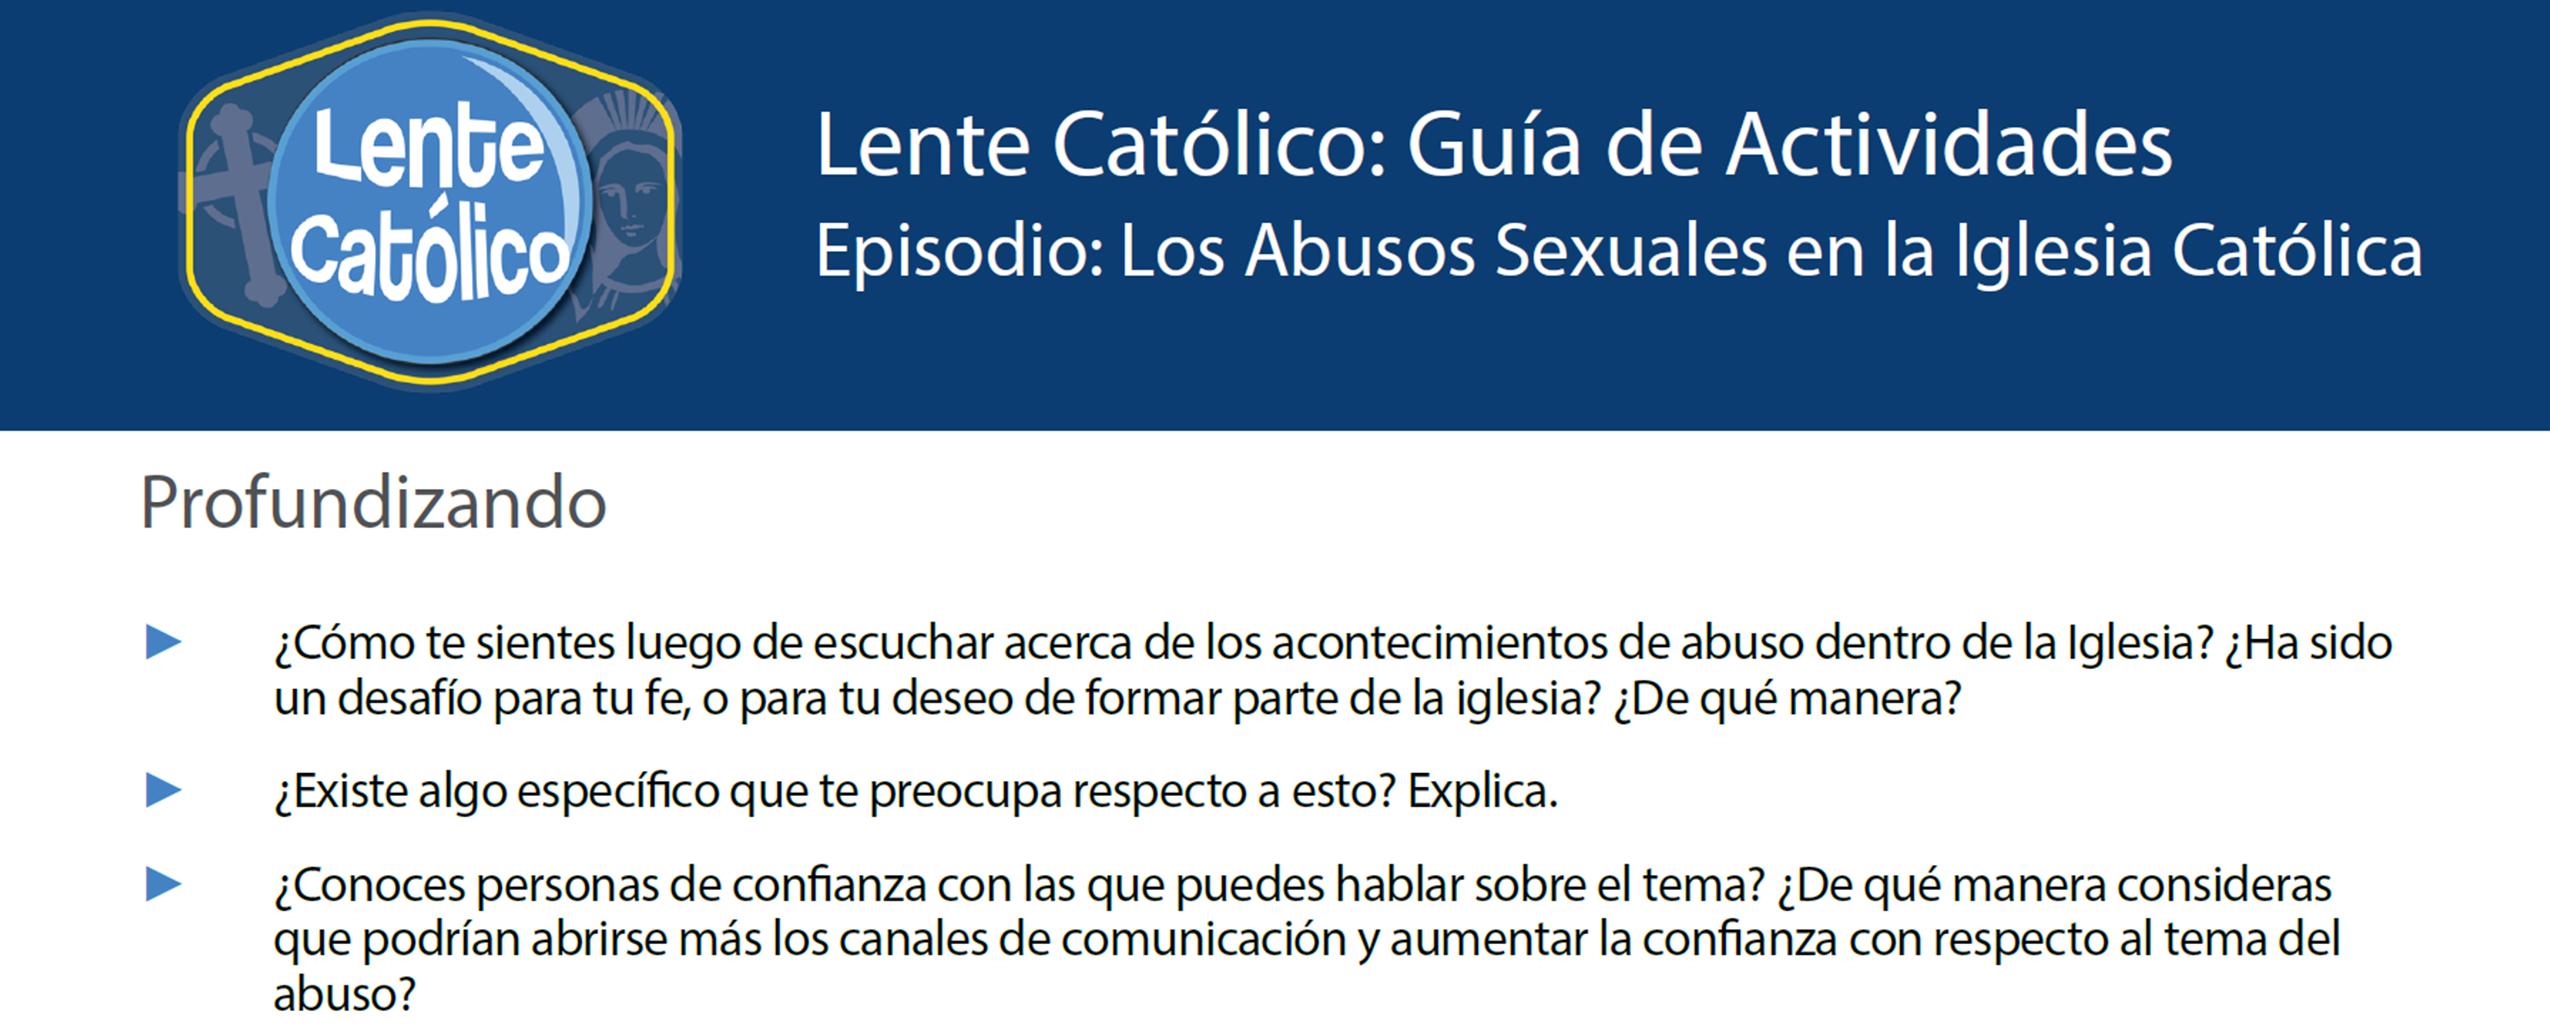 AbusosSexuales_Thumb